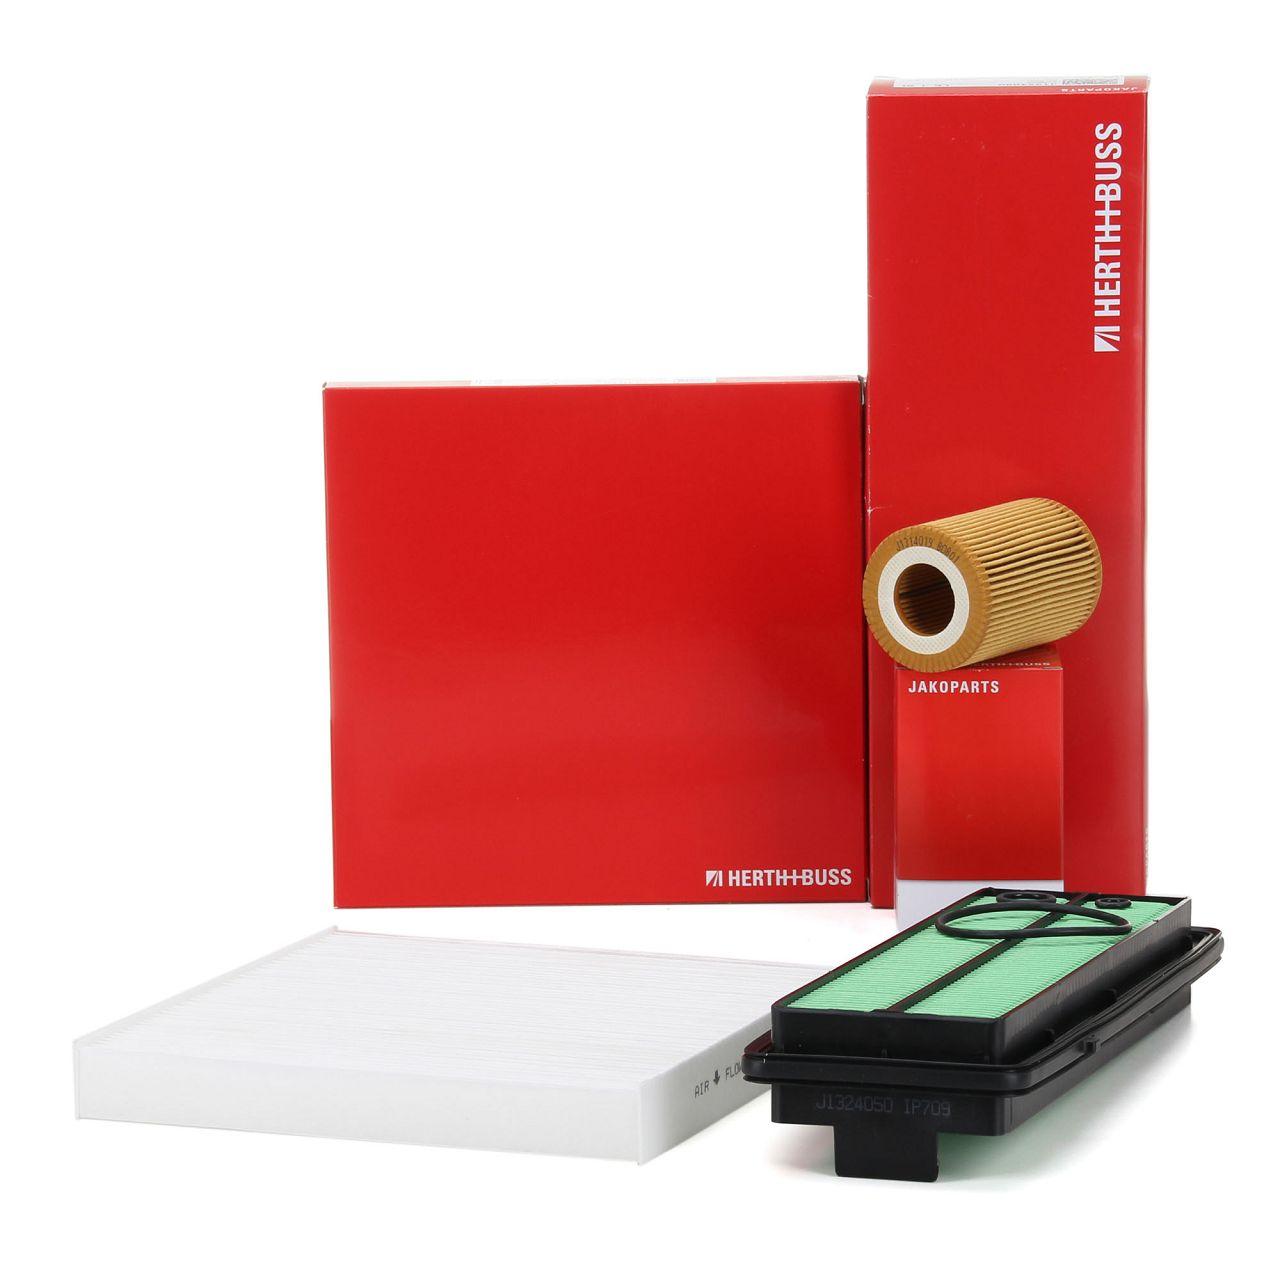 HERTH+BUSS JAKOPARTS Inspektionskit Filterpaket für HONDA ACCORD VIII 2.2 i-DTEC